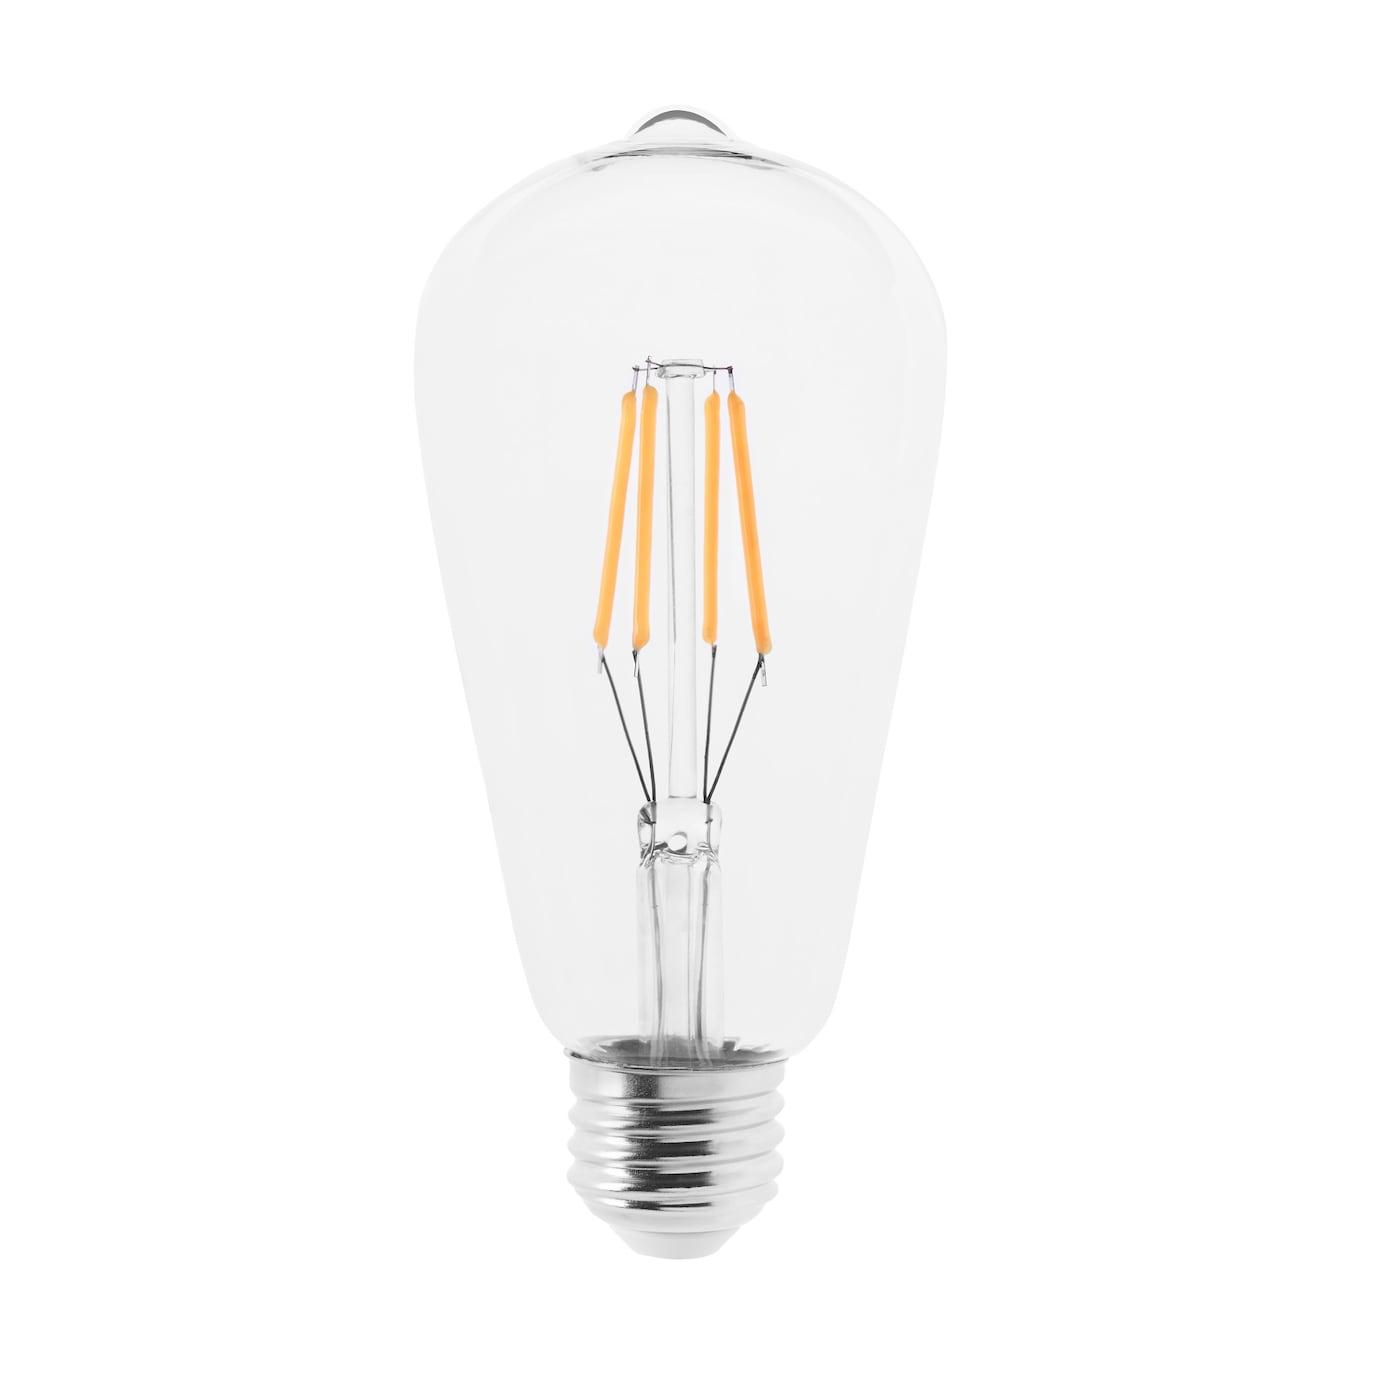 lunnom-led-bulb-e27-400-lumen-drop-shaped-clear-glass__0513092_pe638789_s5 Faszinierend Gu10 Led 400 Lumen Dekorationen